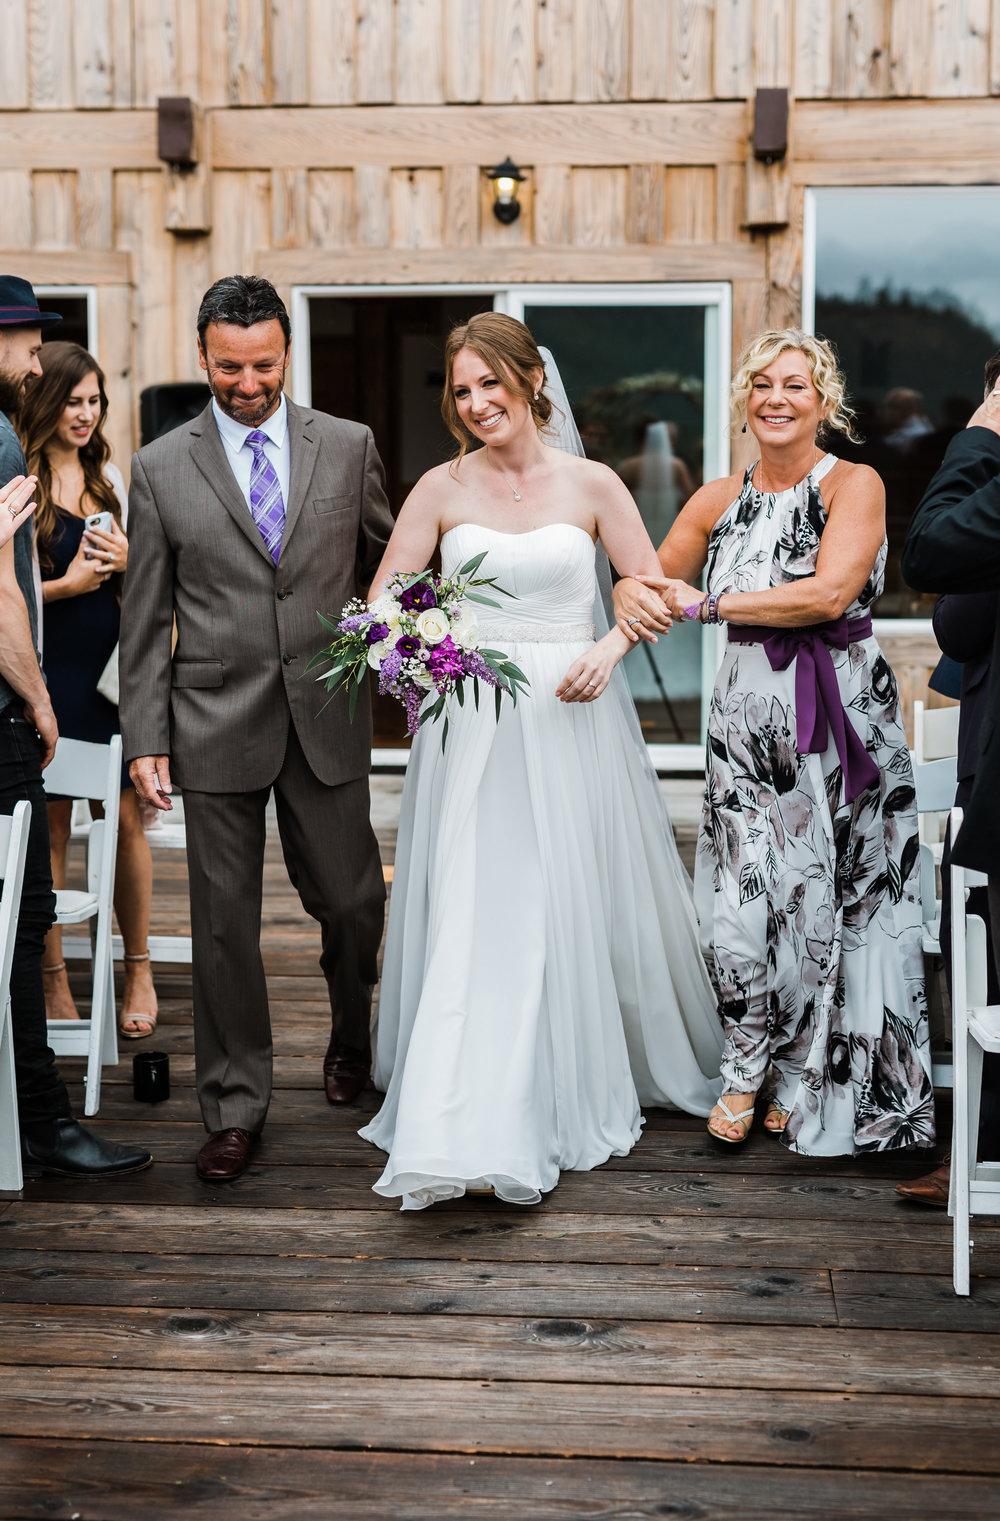 West Coast Wilderness Lodge Wedding Photos - Vancouver Wedding Photographer & Videographer - Sunshine Coast Wedding Photos - Sunshine Coast Wedding Photographer - Jennifer Picard Photography - IMG_4612.jpg